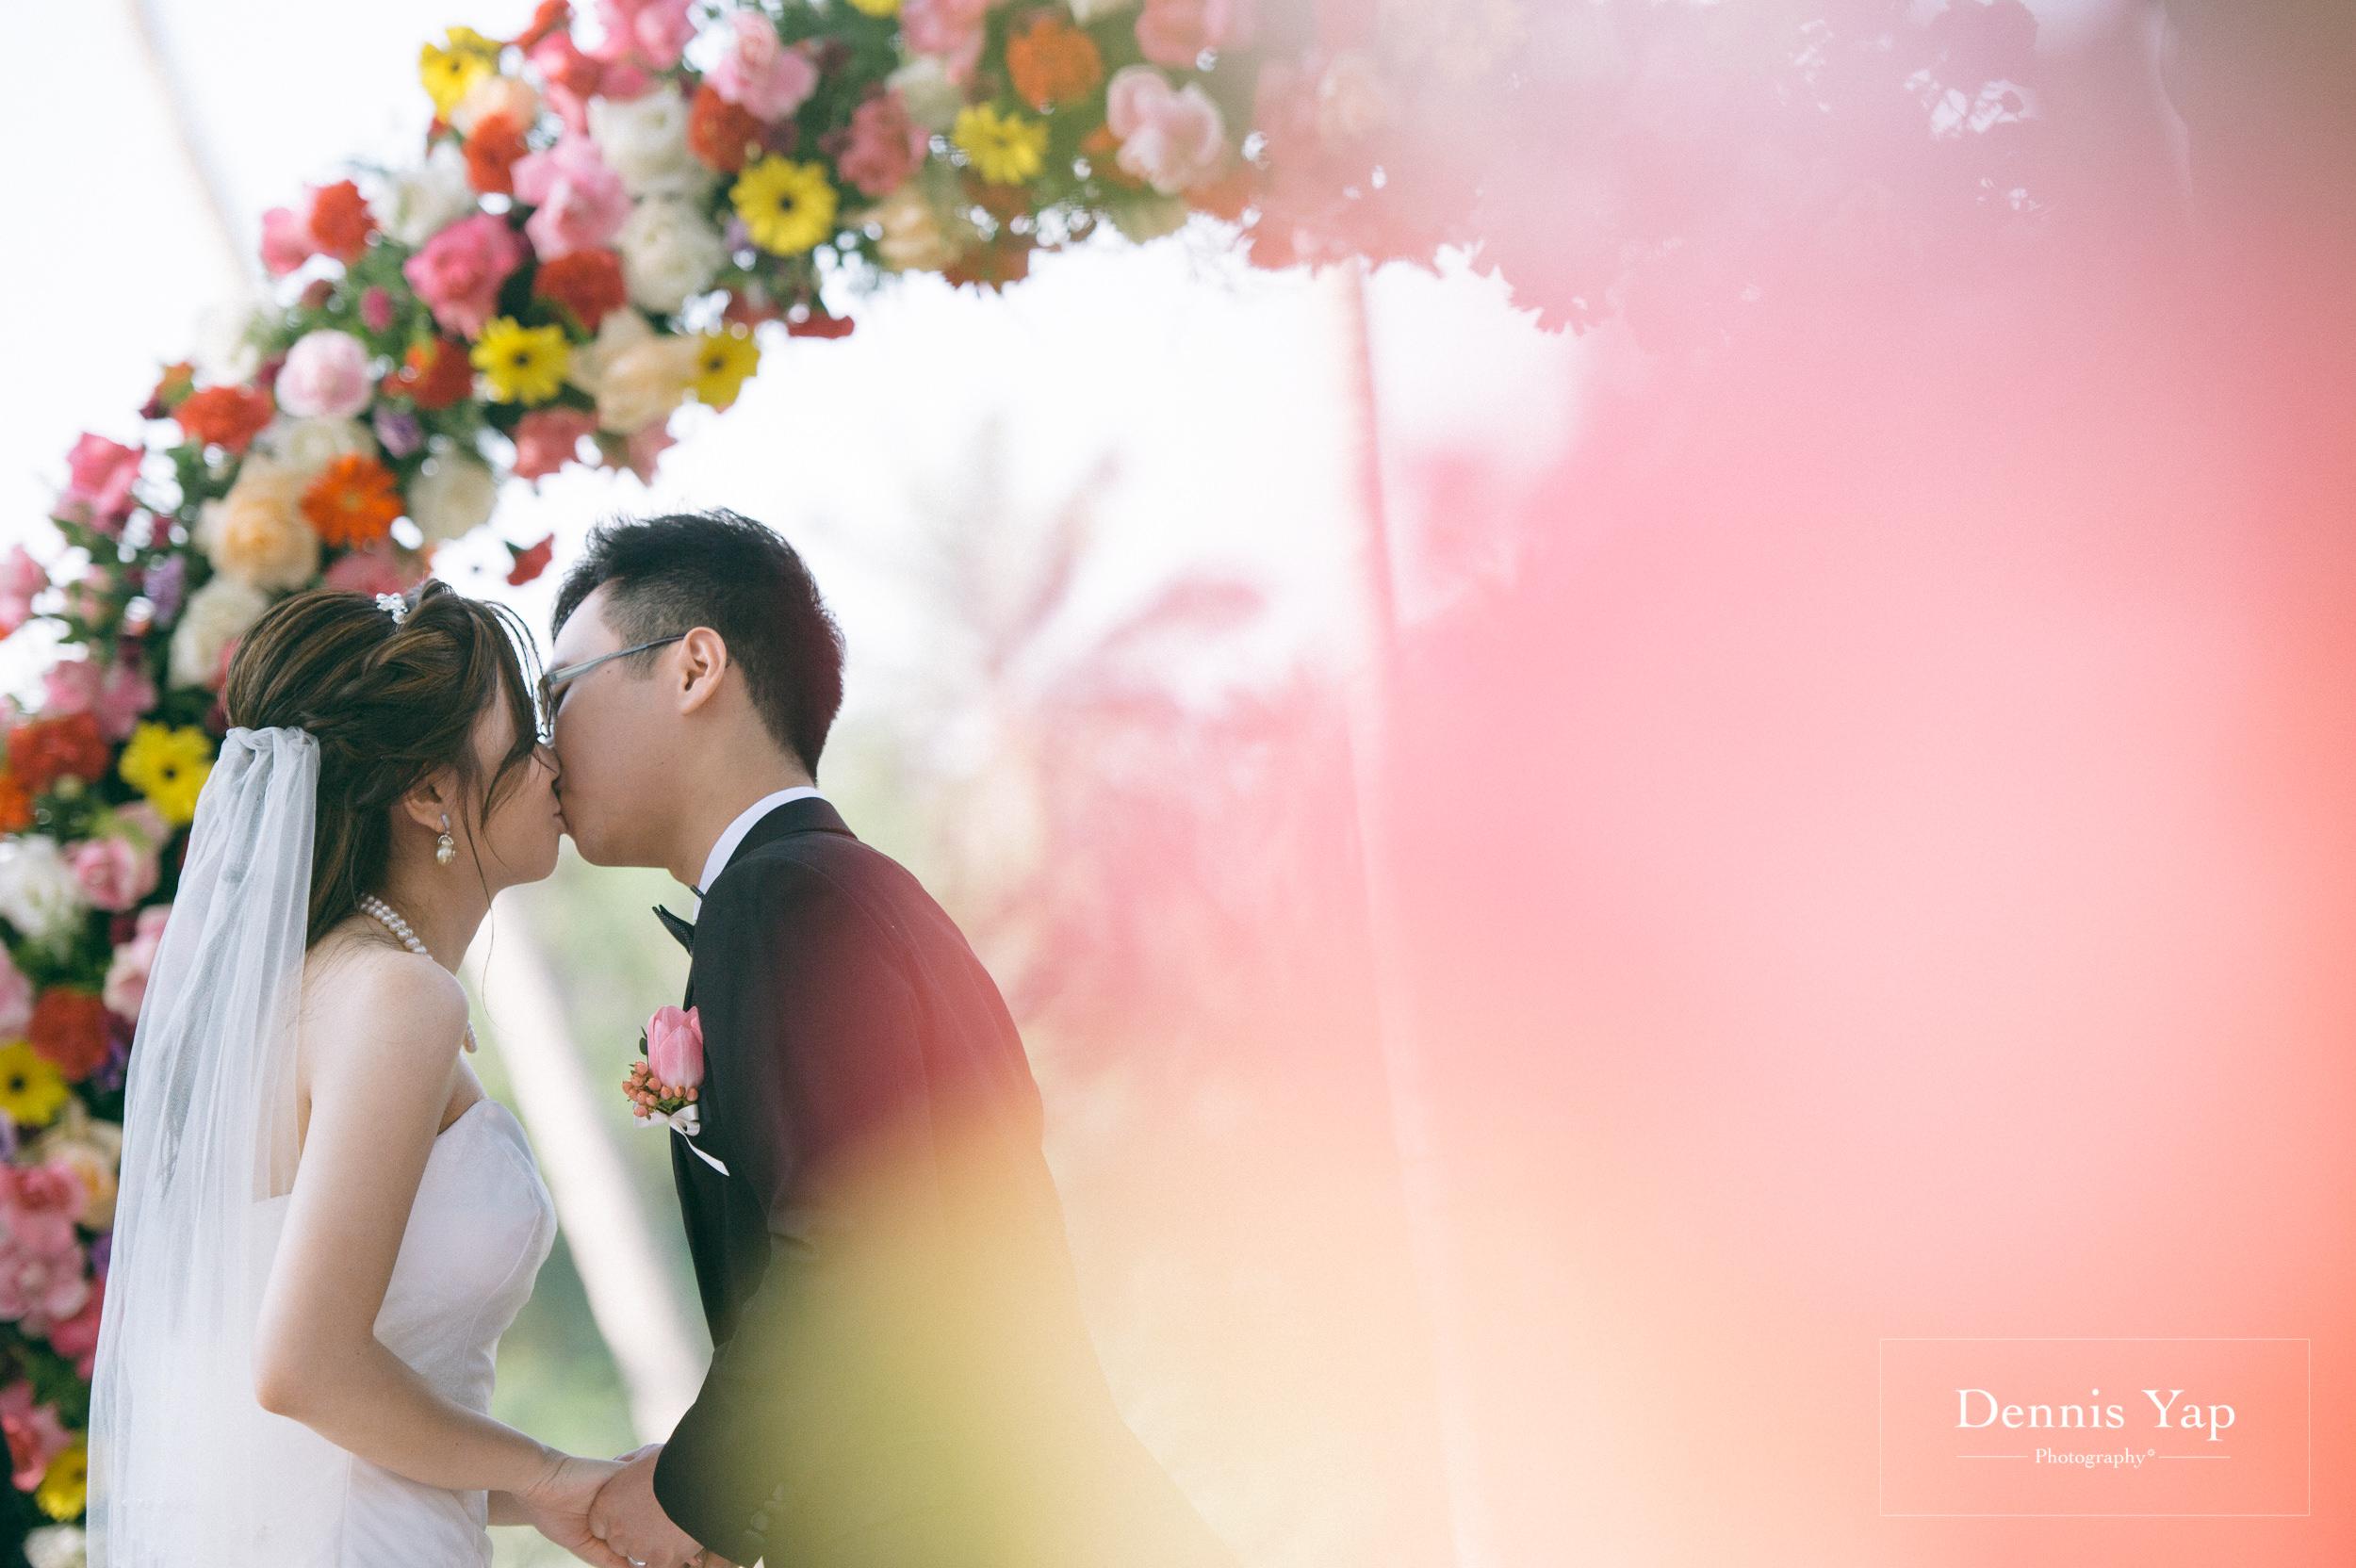 taylai cheng yee garden wedding saujana hotel subang jaya dennis yap photography sunlight-17.jpg